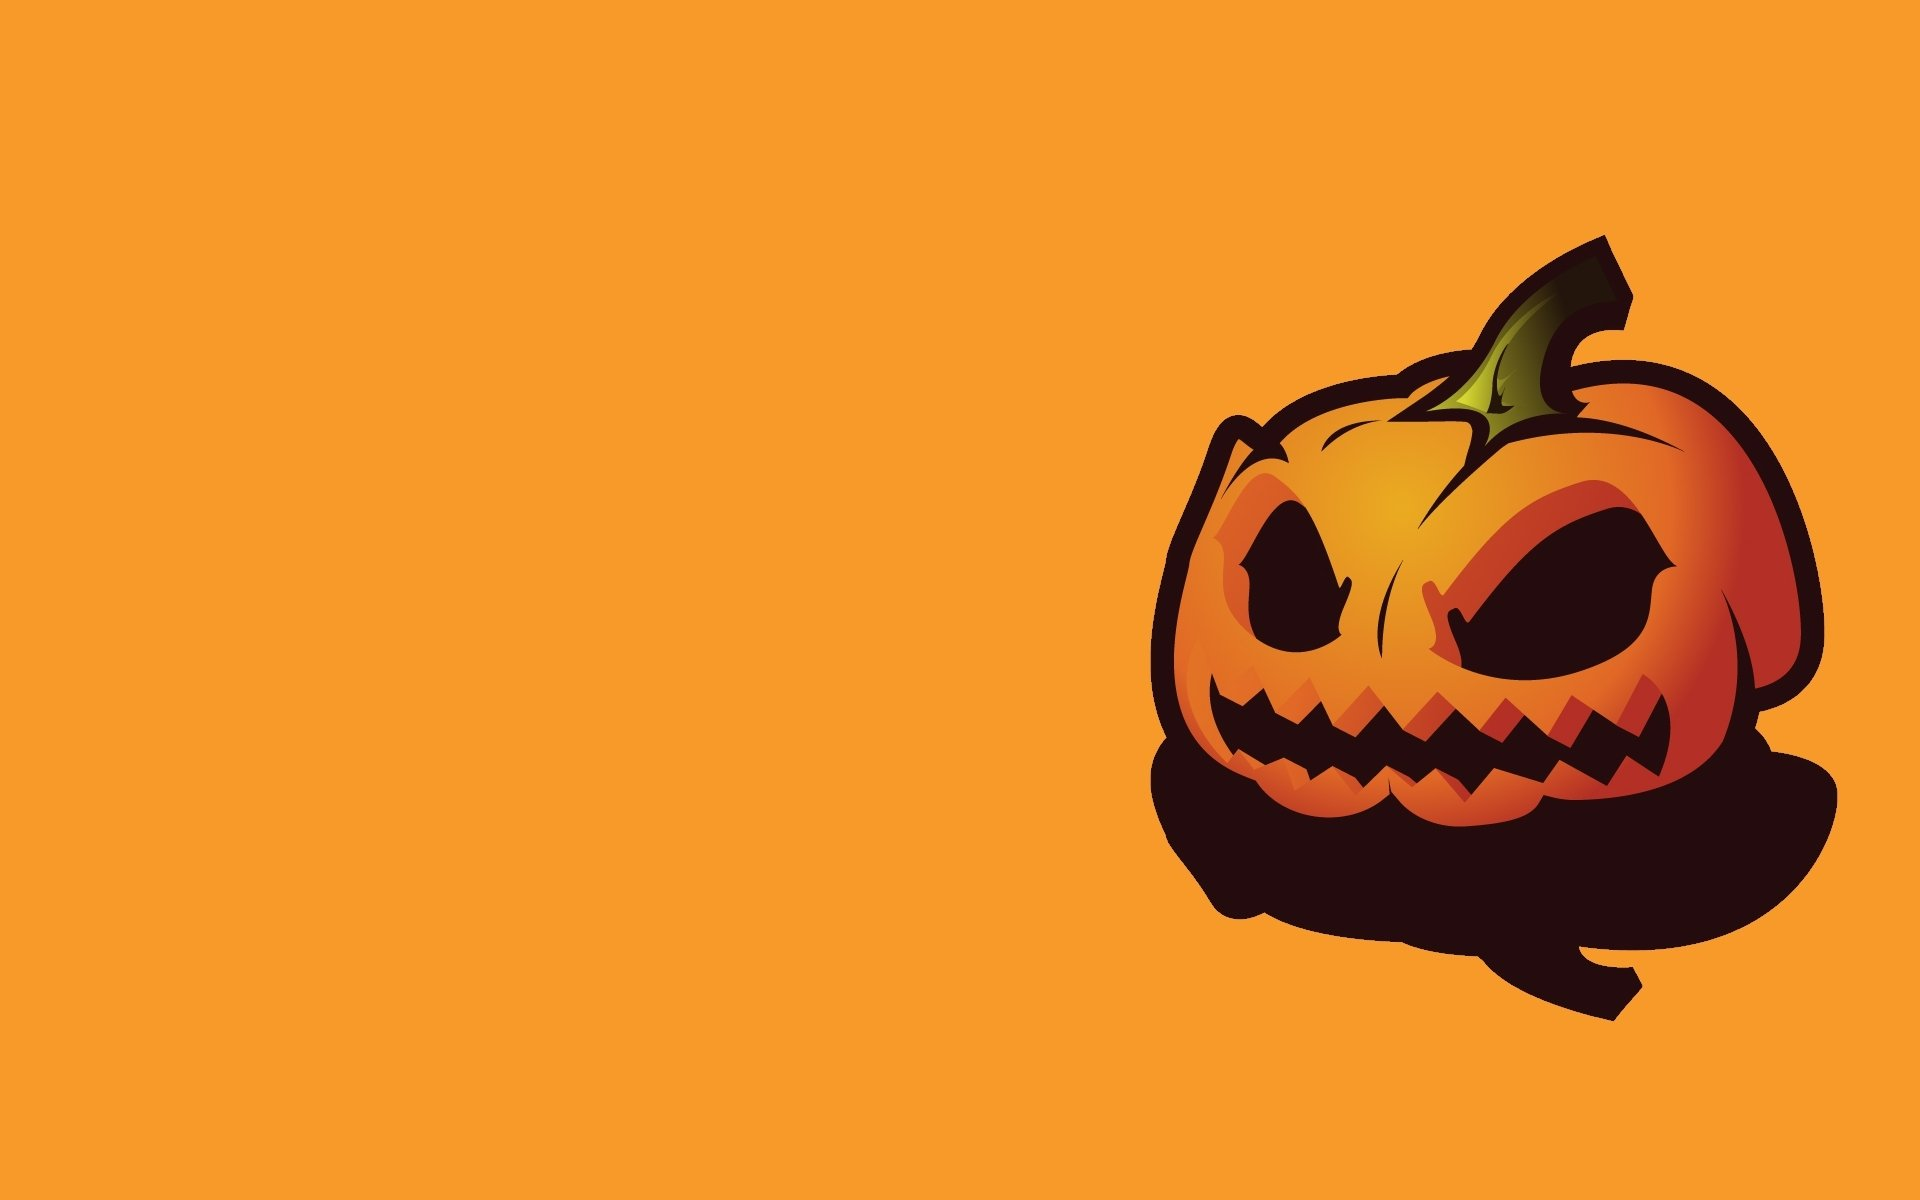 Fondo De Pantalla 1920x1200 Id: Halloween Fondo De Pantalla HD